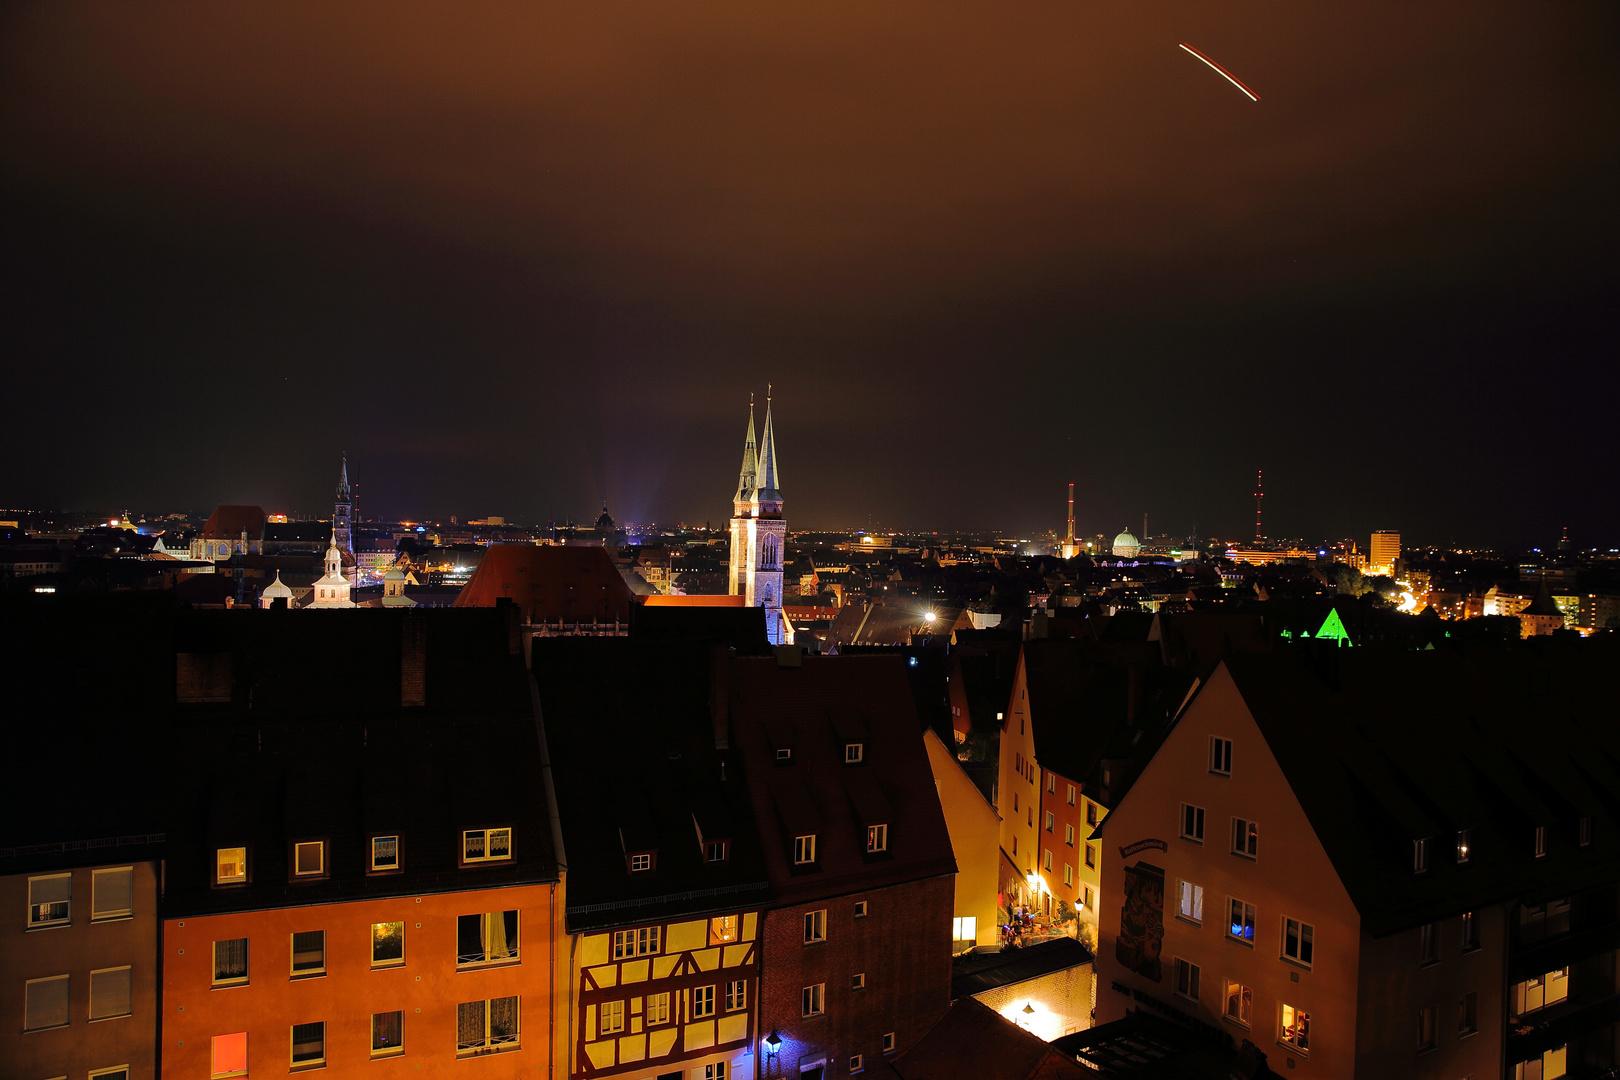 A blue night over Nuremberg